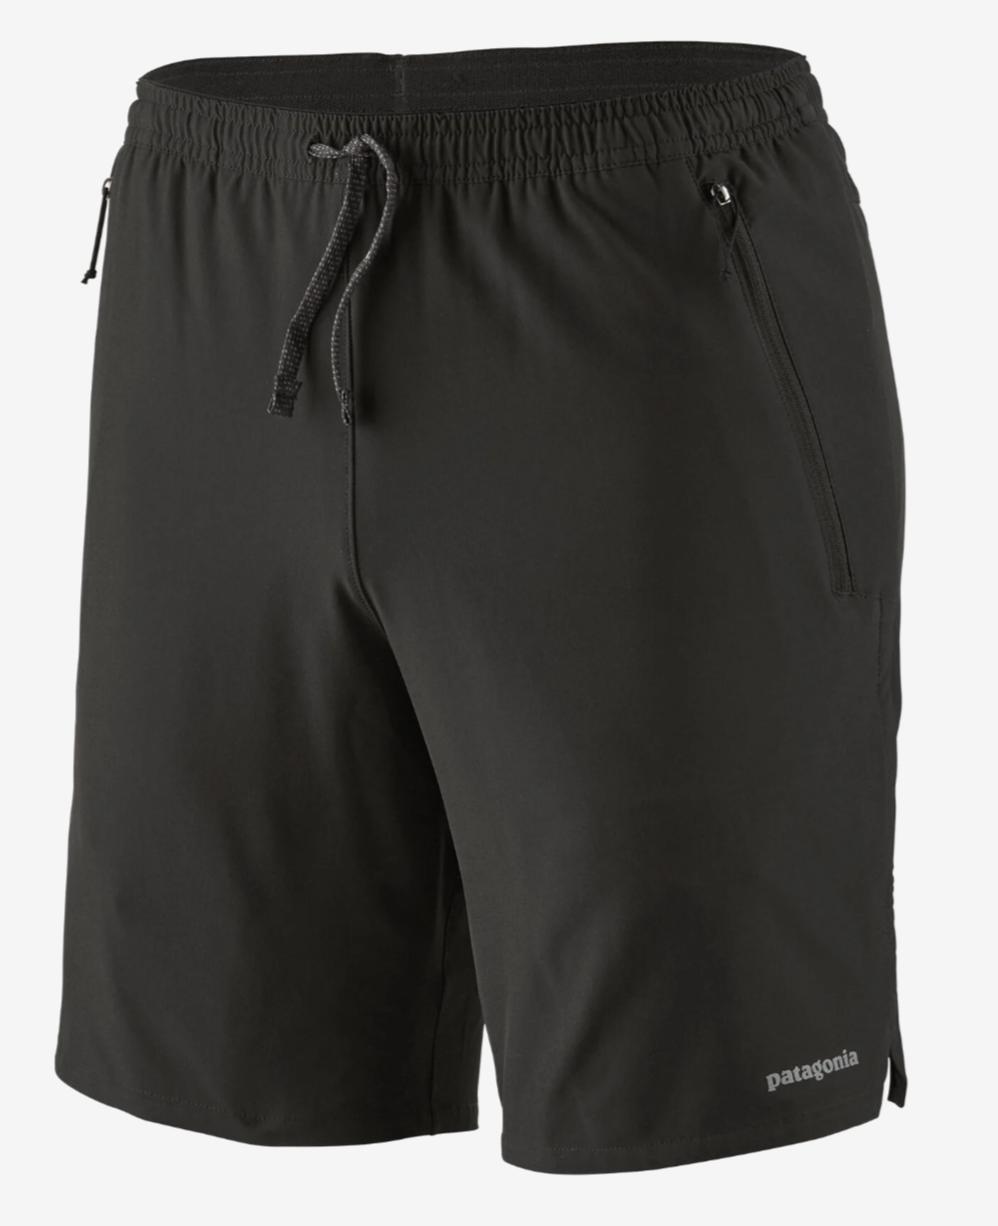 "Patagonia Nine Trails Shorts 8"" Men's"